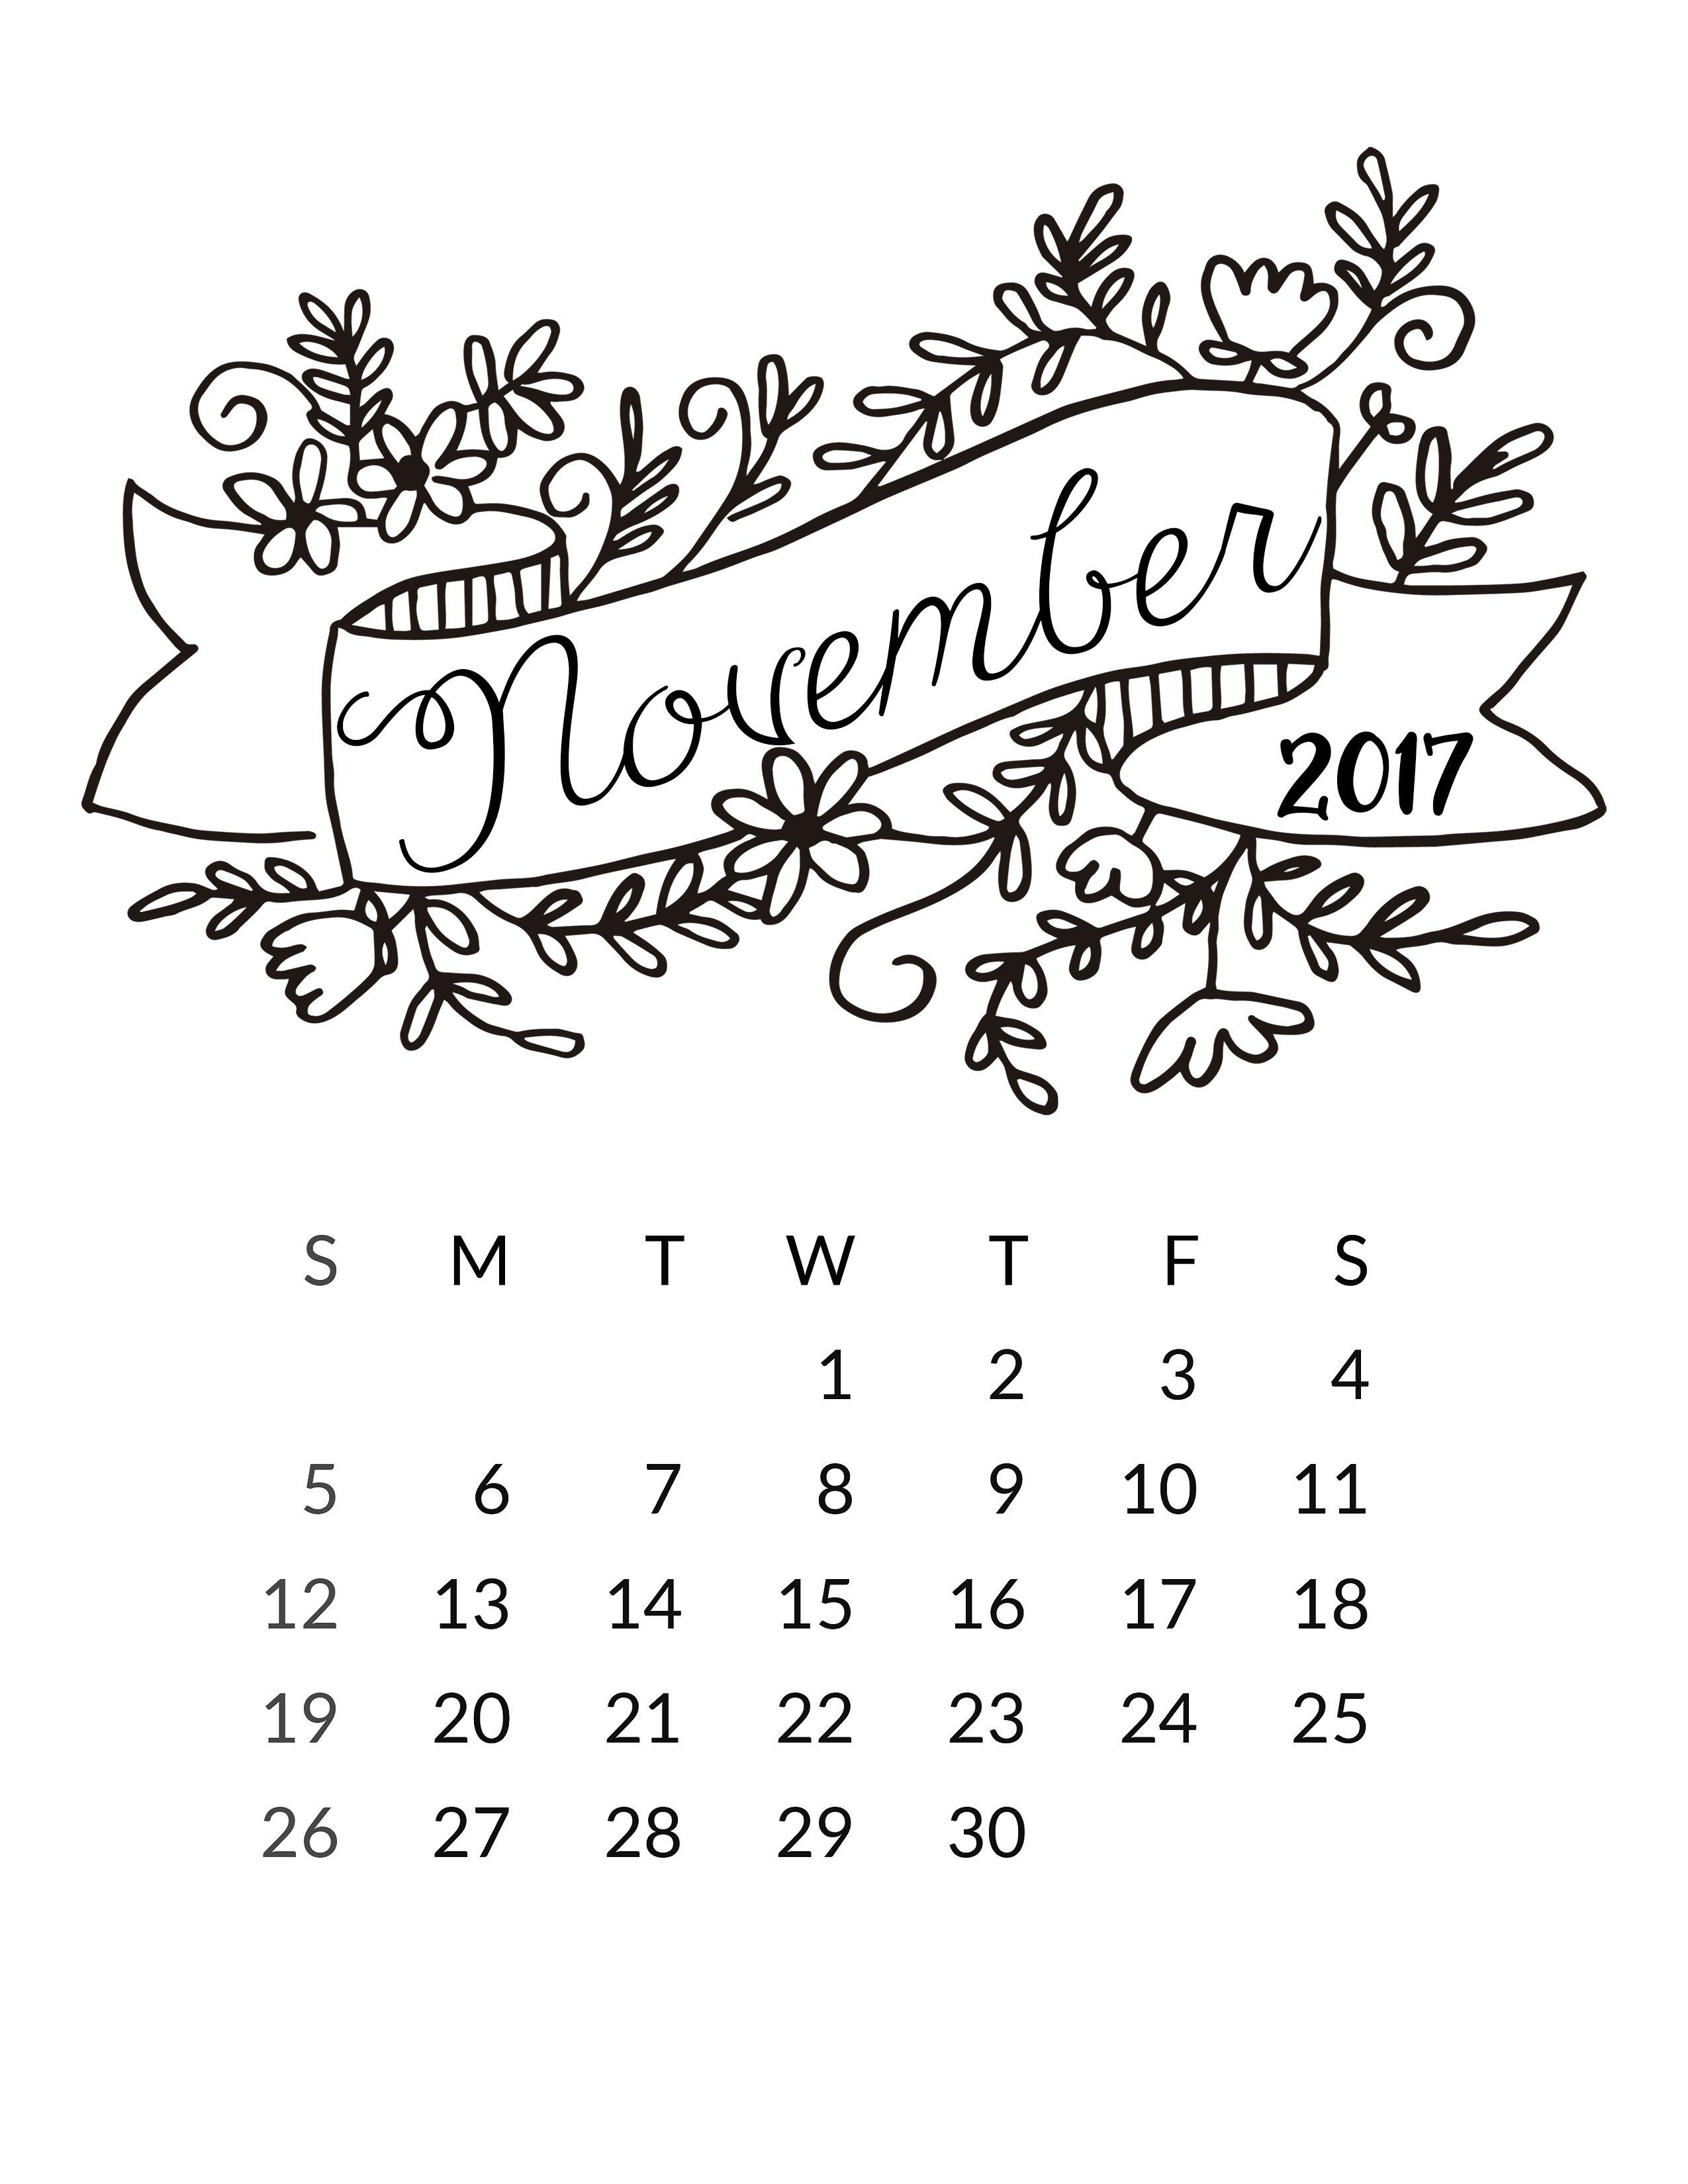 pin by nicci on baby 3 bullet journal journal bullet 2016 Calendar Nov Dec freeprettythingsforyou wp content uploads 2016 12 11 nov 2017